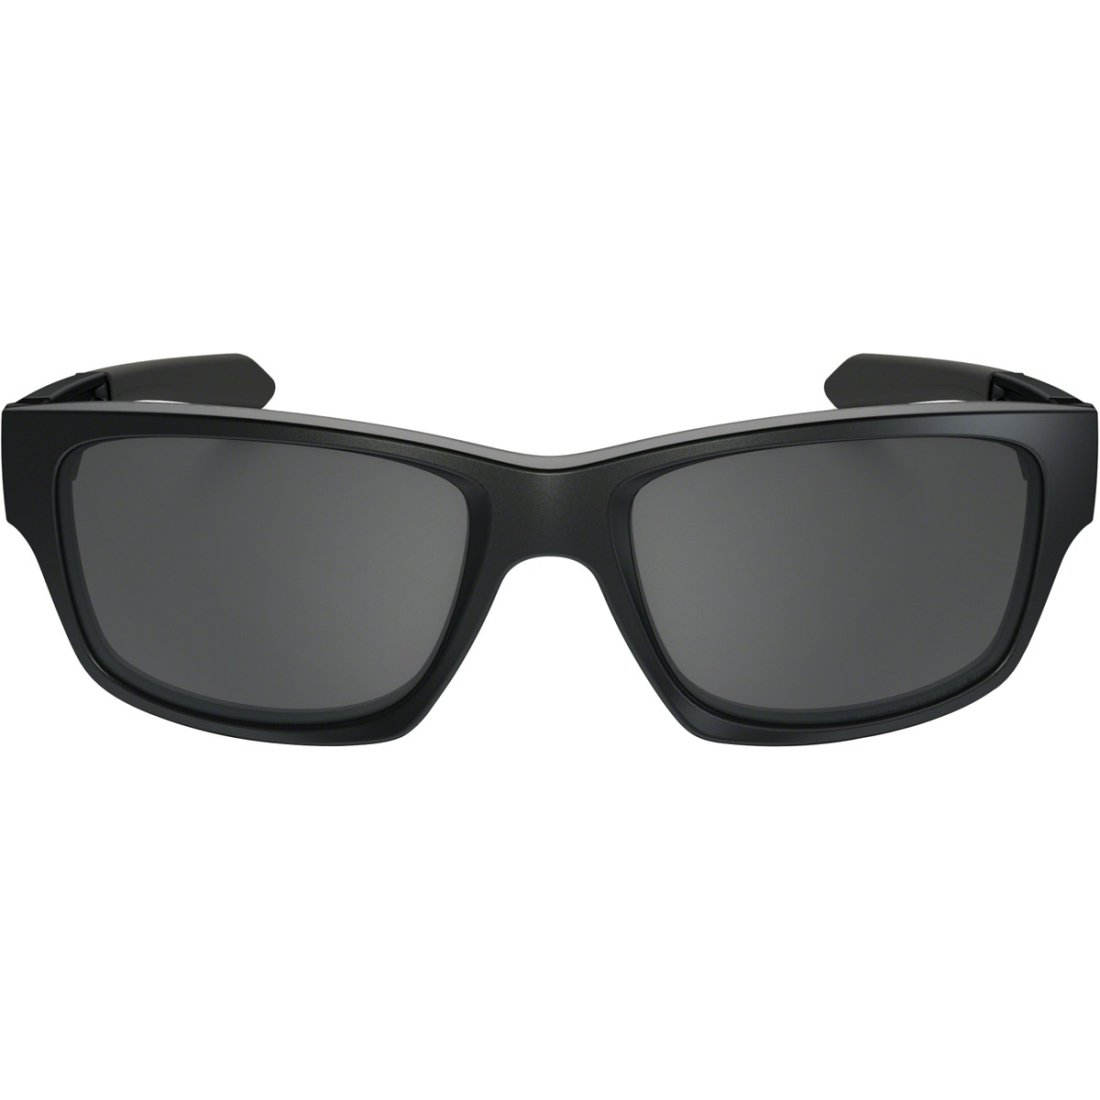 ea7e5f1948 OAKLEY Jupiter Squared Matte Black   Black Iridium Polarized Sun glasses